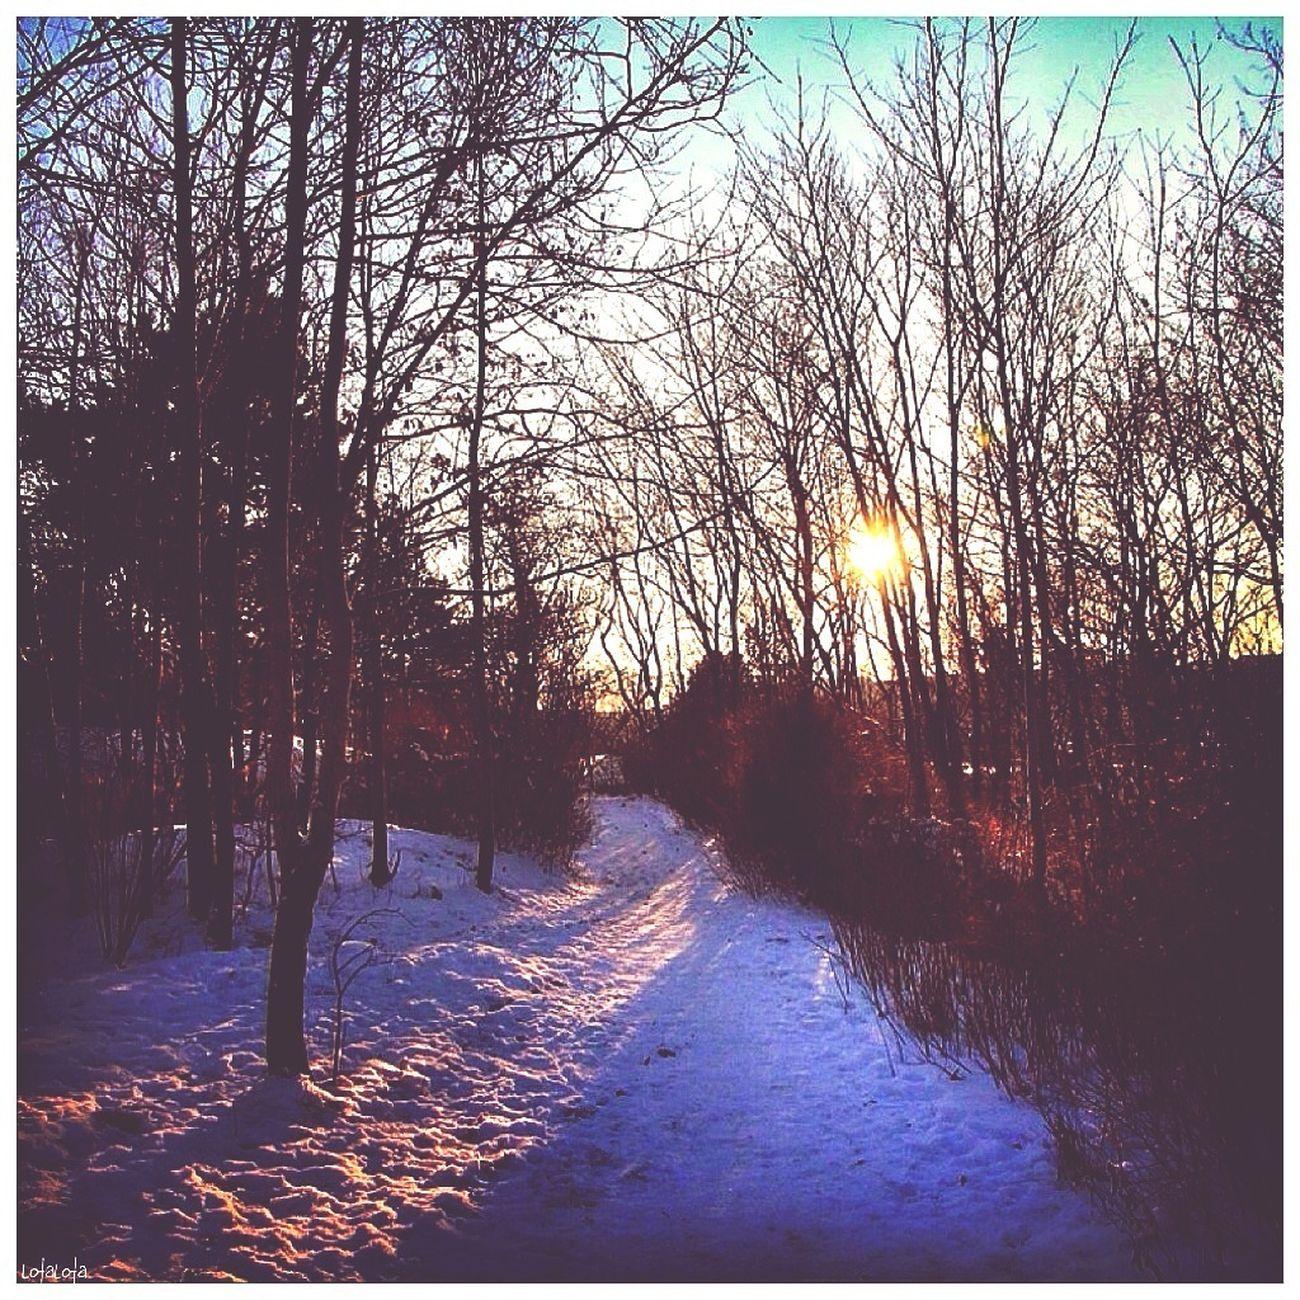 Good Morning From Sweden